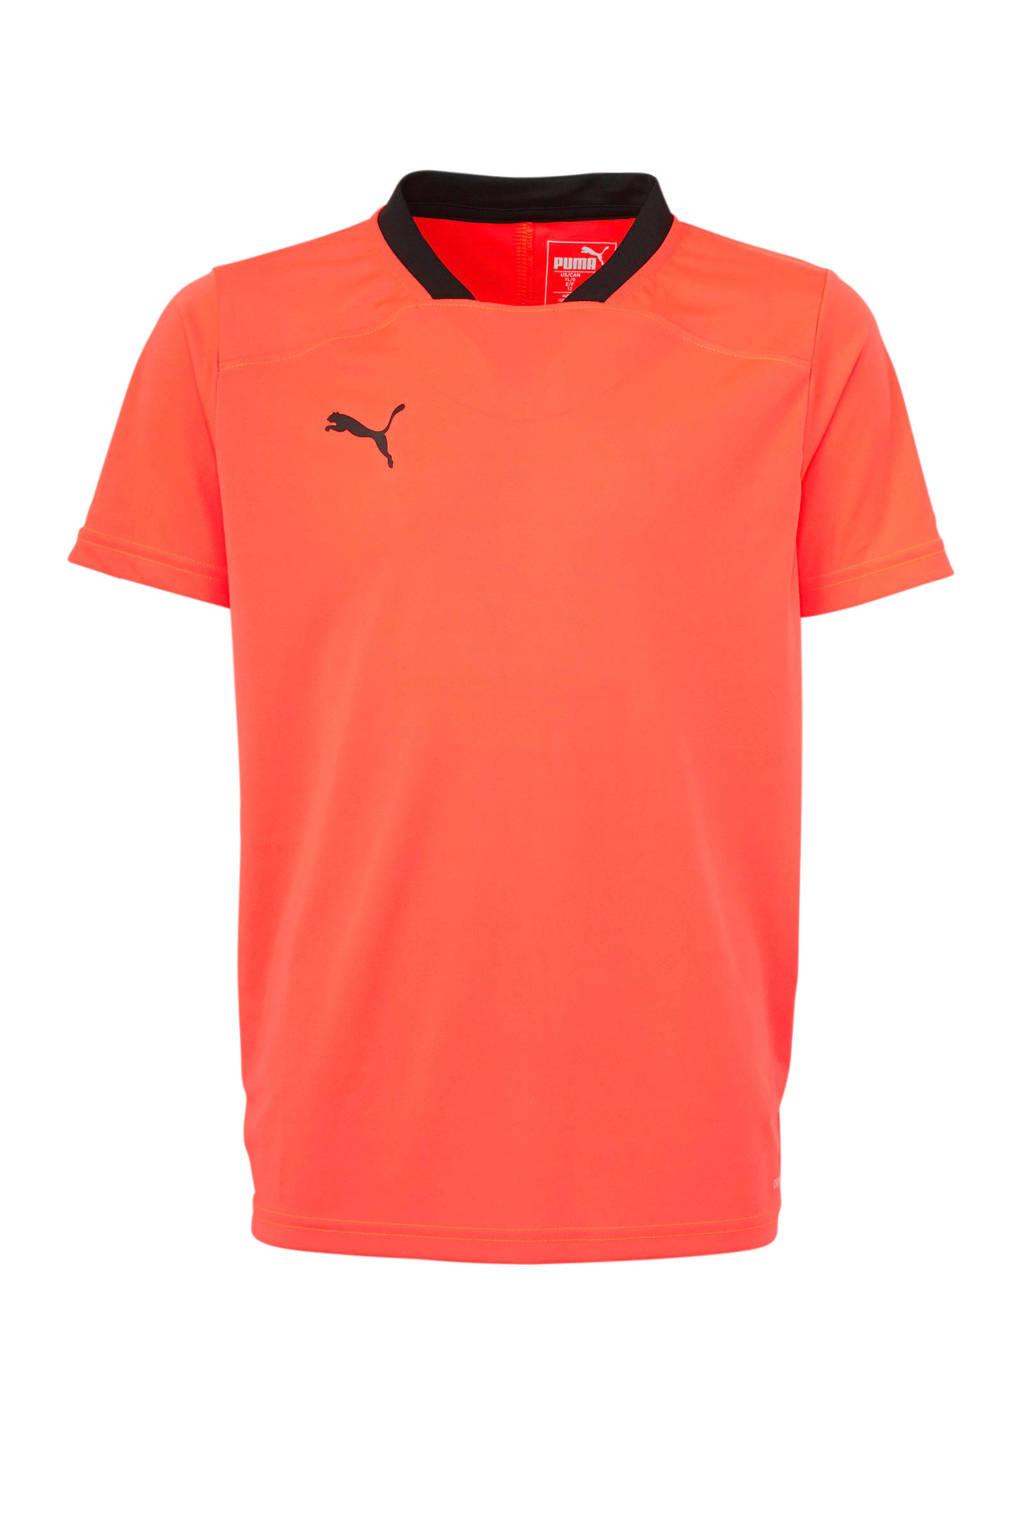 Puma   voetbalshirt oranje/zwart, Oranje/zwart